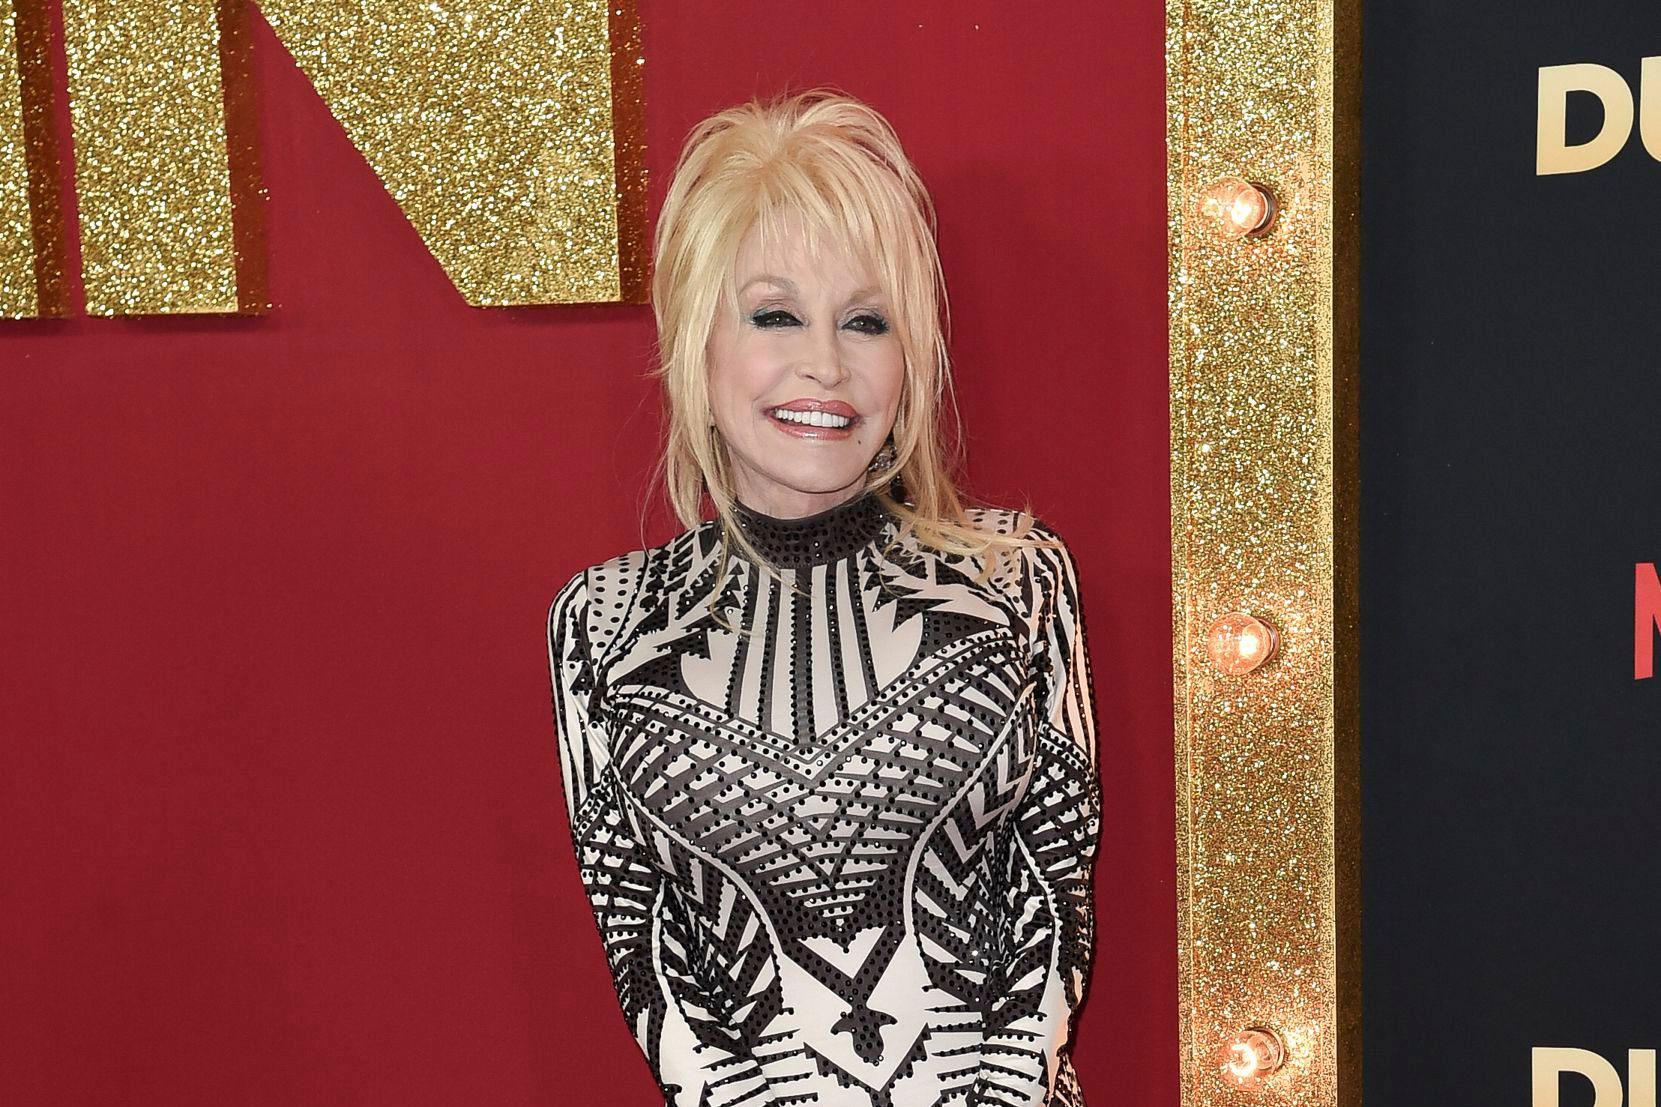 Dolly Parton Tribute Set for 2019 Grammys